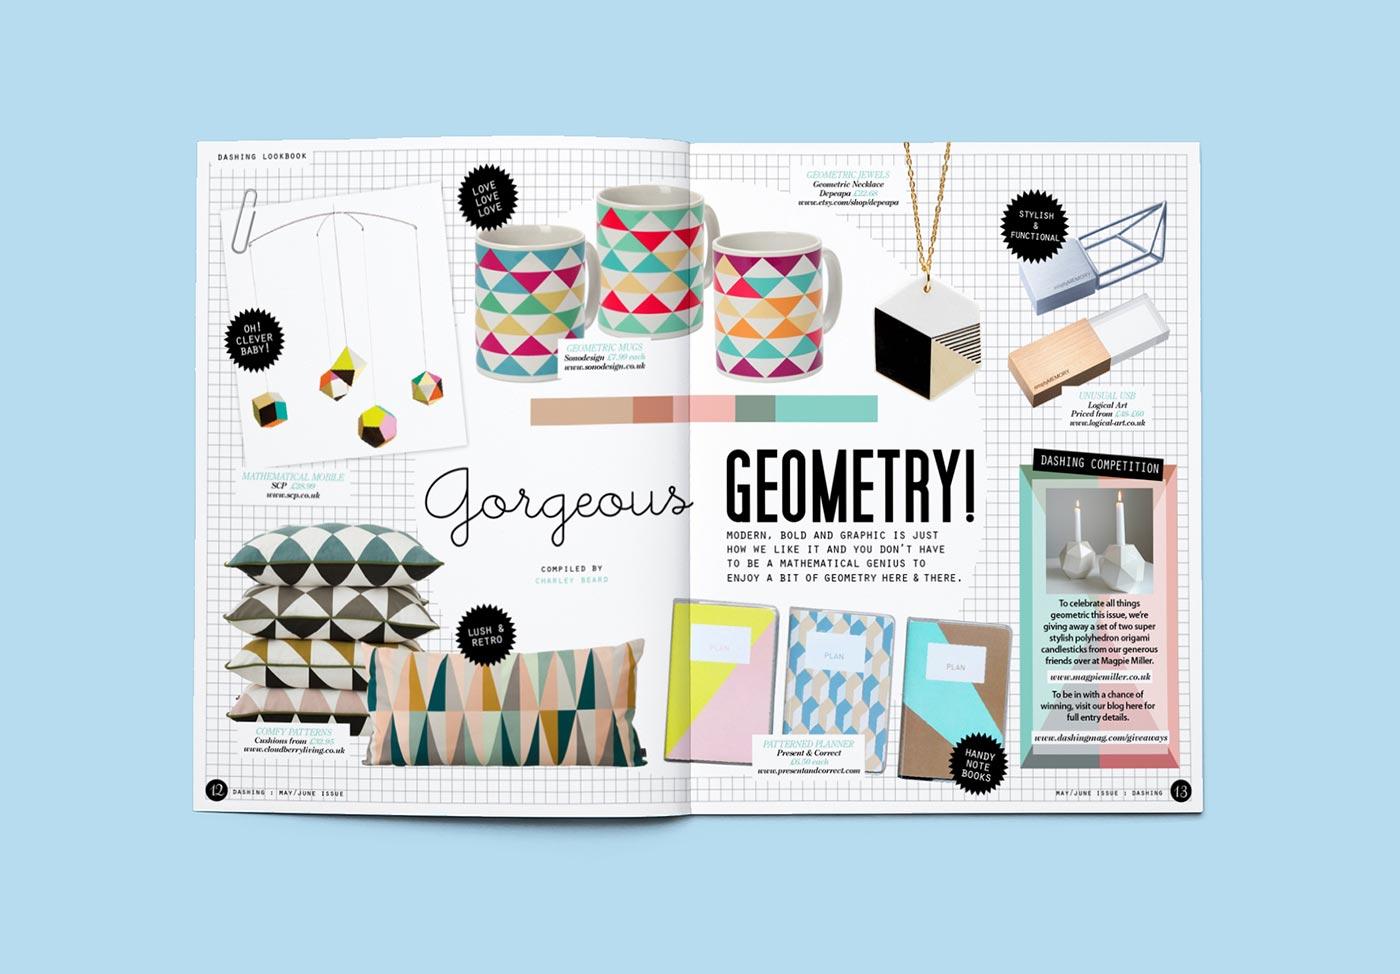 superfly-creative-fanni-williams-graphic-design-editorial-dashing-online-magazine-ebook-publishing-2-opti.jpg